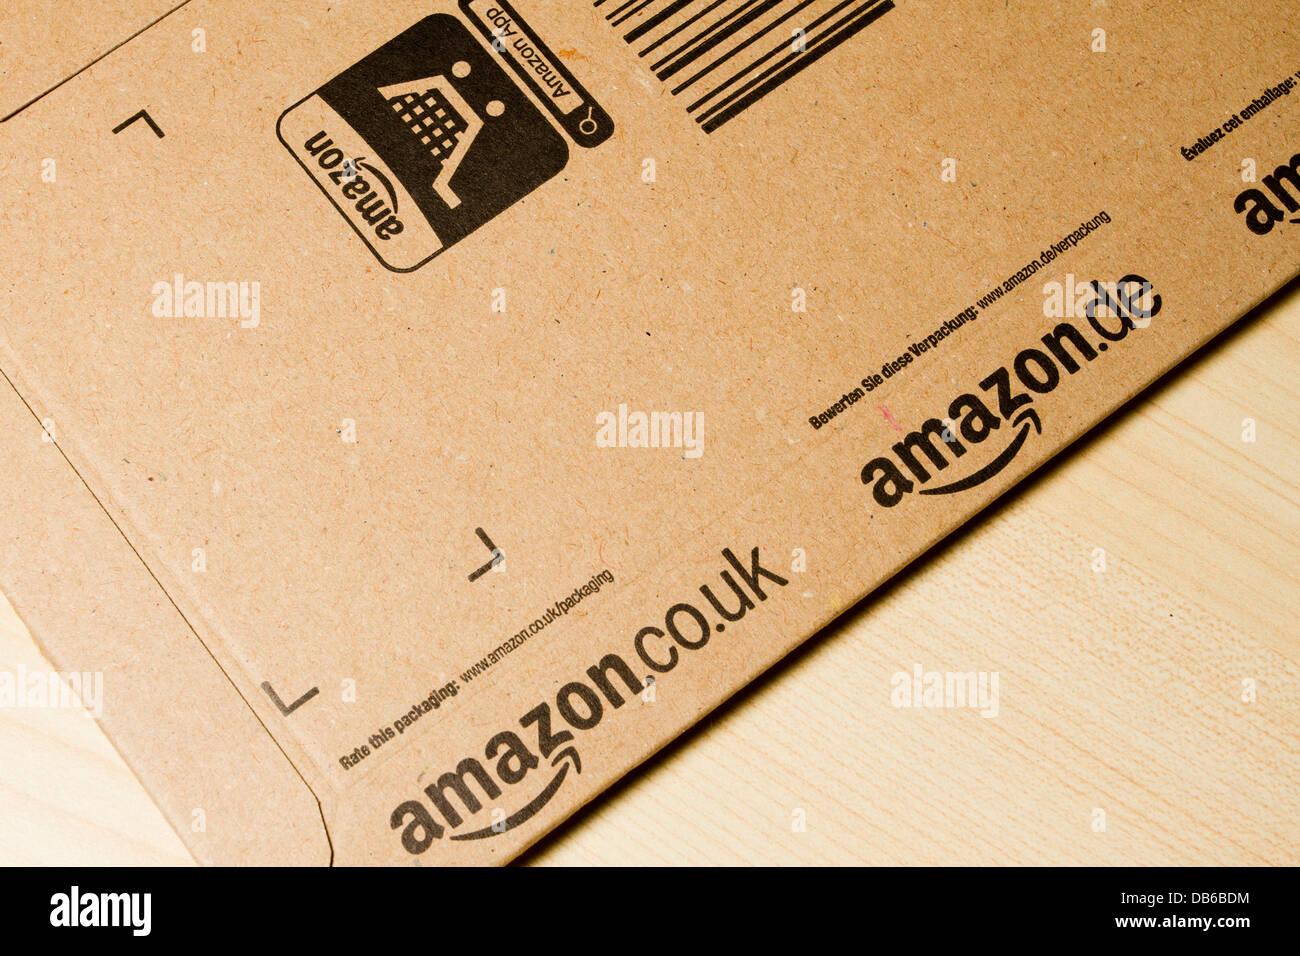 Amazon Lieferung, Karte Umschlag, England, UK Stockbild